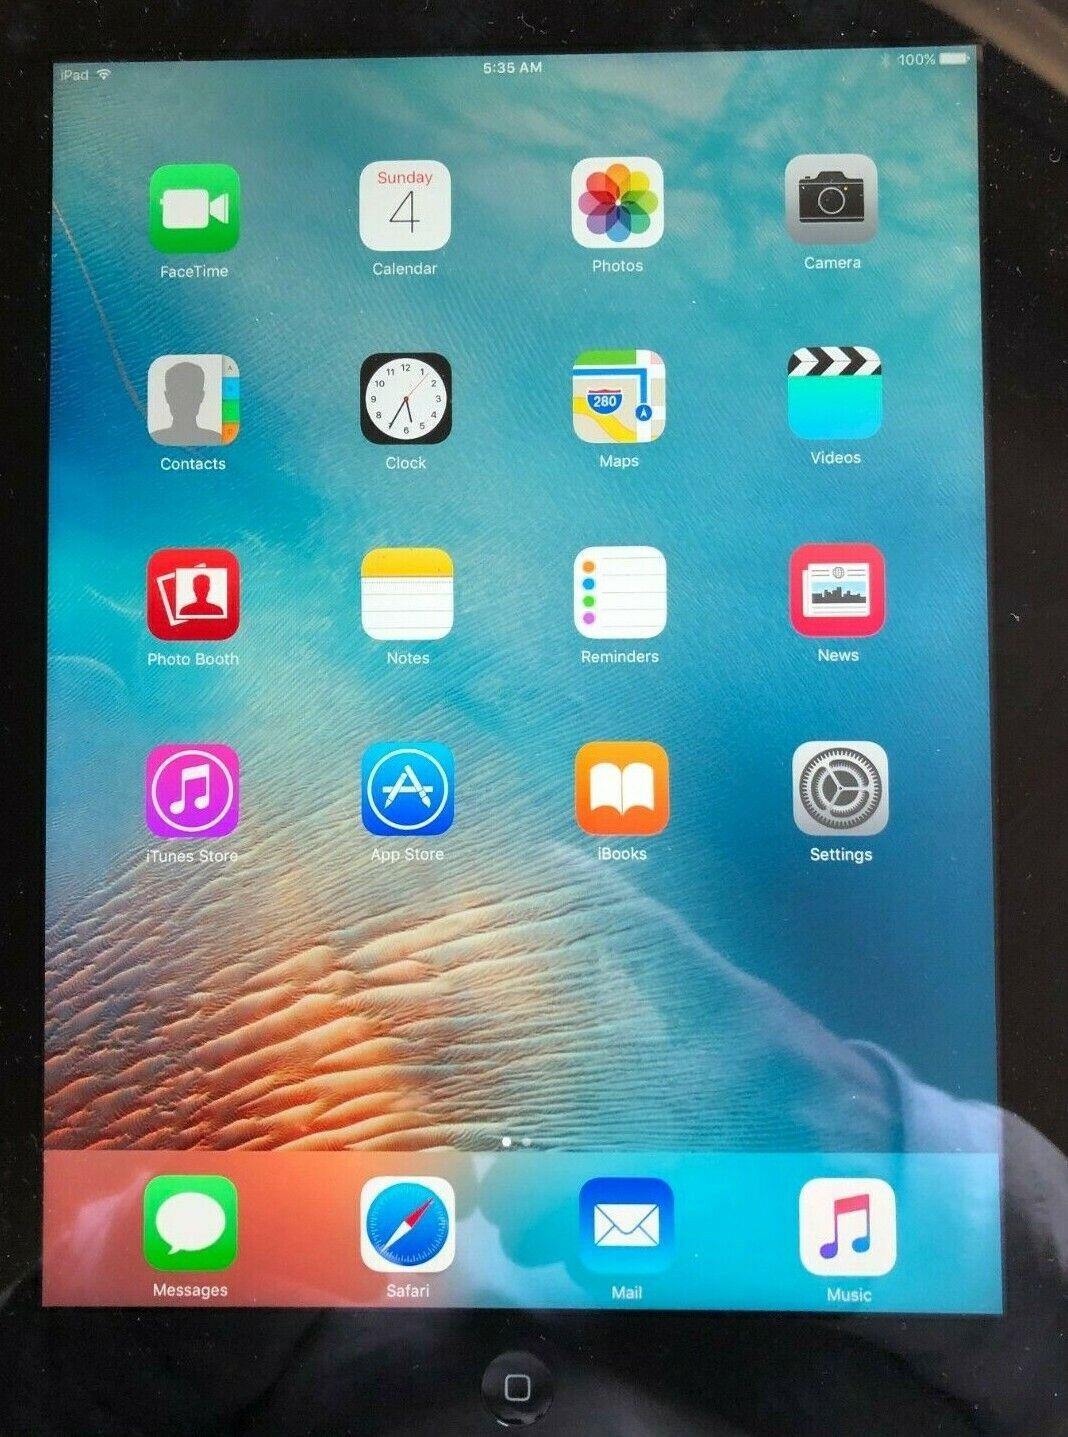 Apple IPad 2 2nd Gen 16GB Wi-Fi 9.7in Black Very Good Condition MC960LL/A A1395 - $29.99